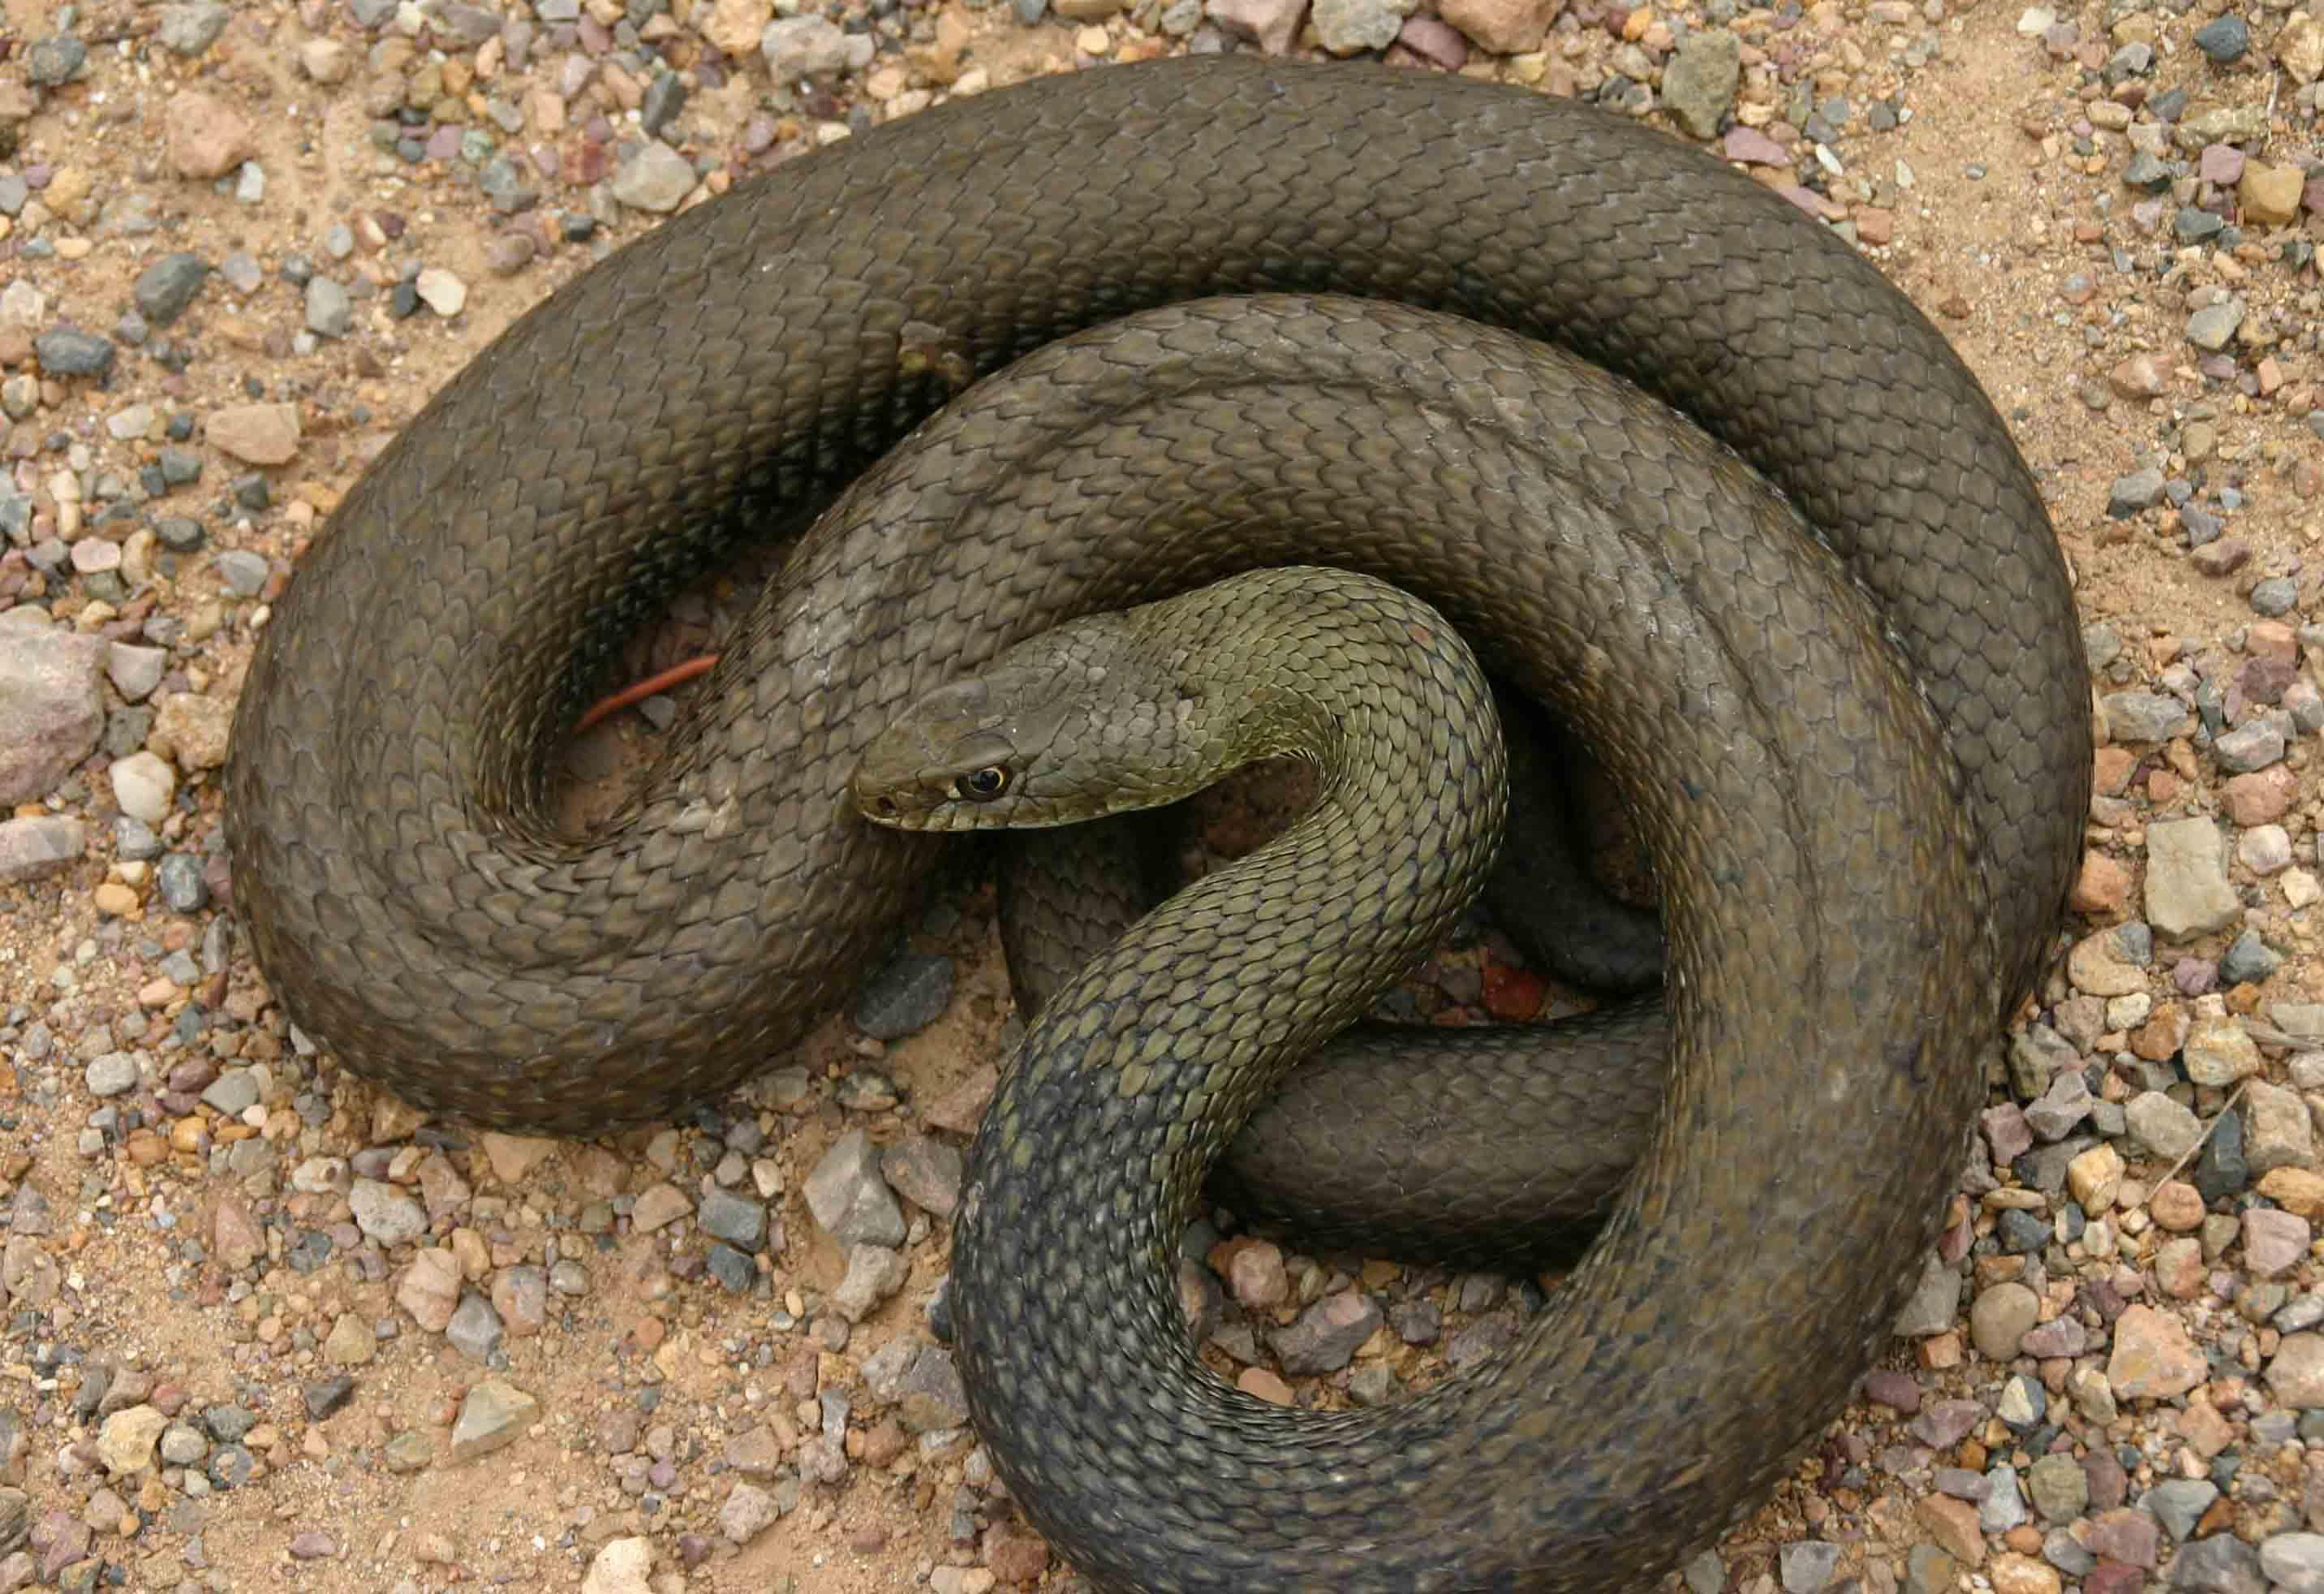 Big Montpellier snake (Malpolon monspessulanus) of nearly two metres